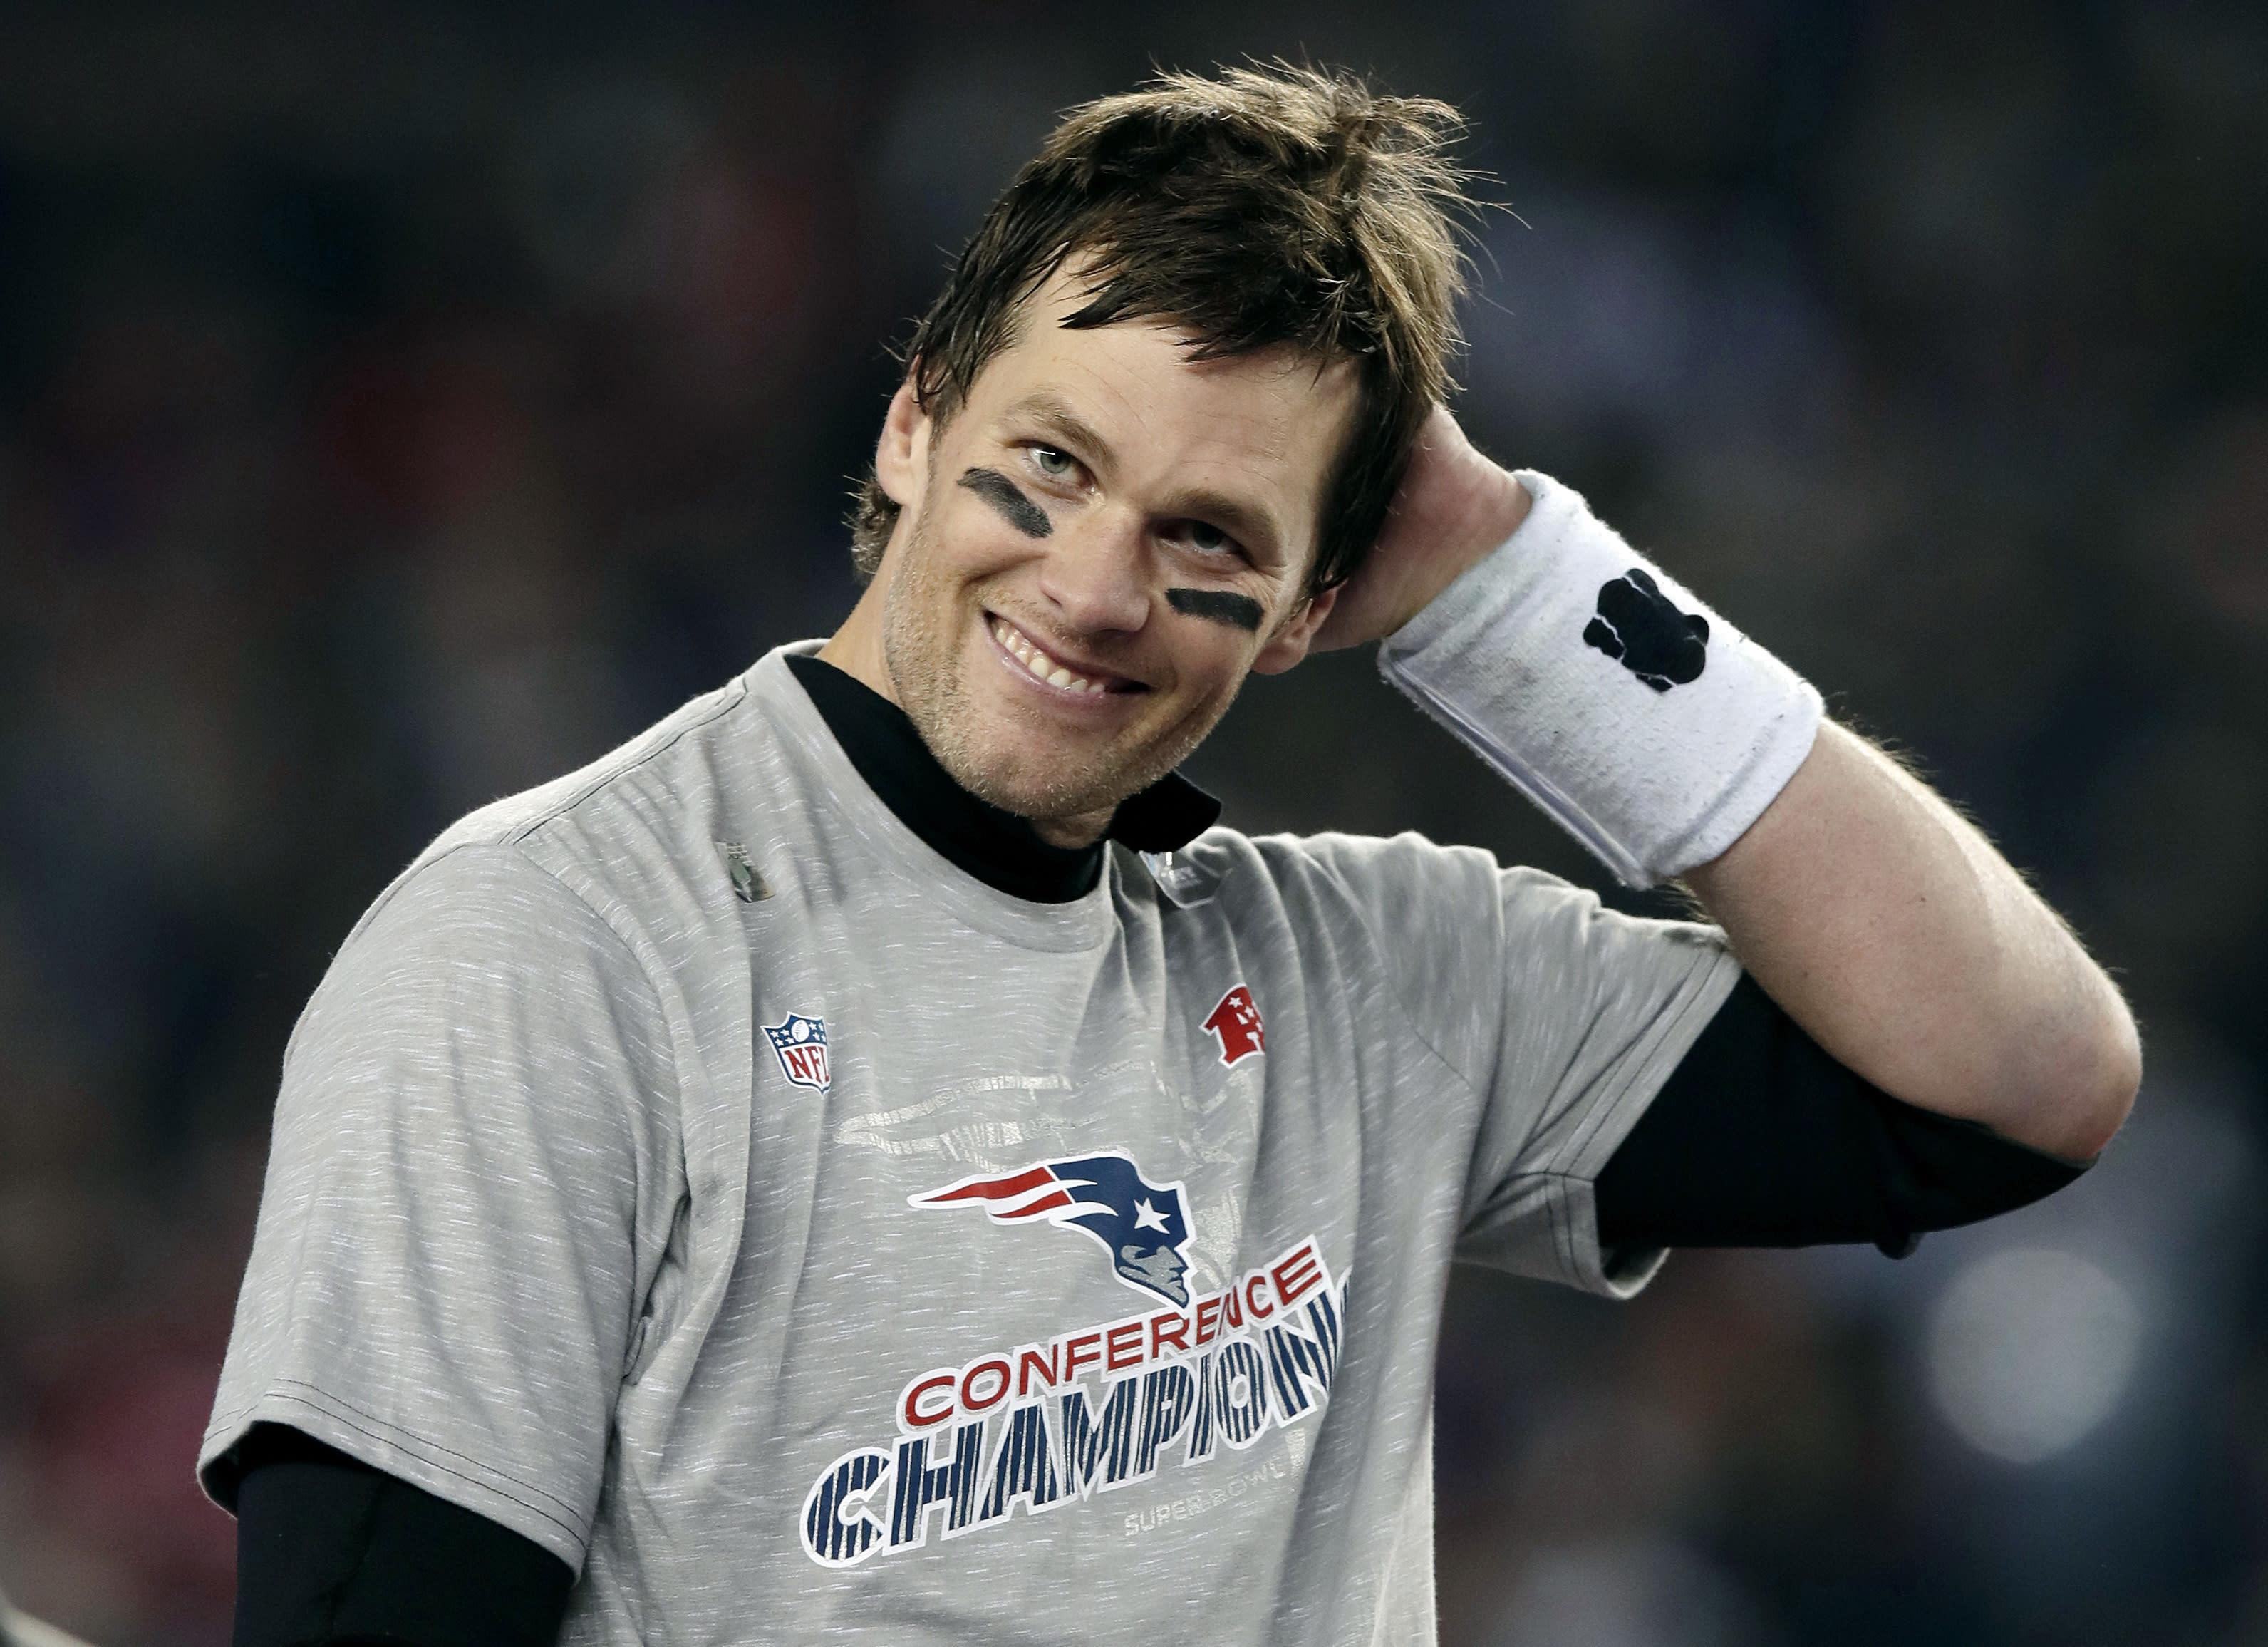 Tom Brady's documentary director doesn't think Brady will play much longer